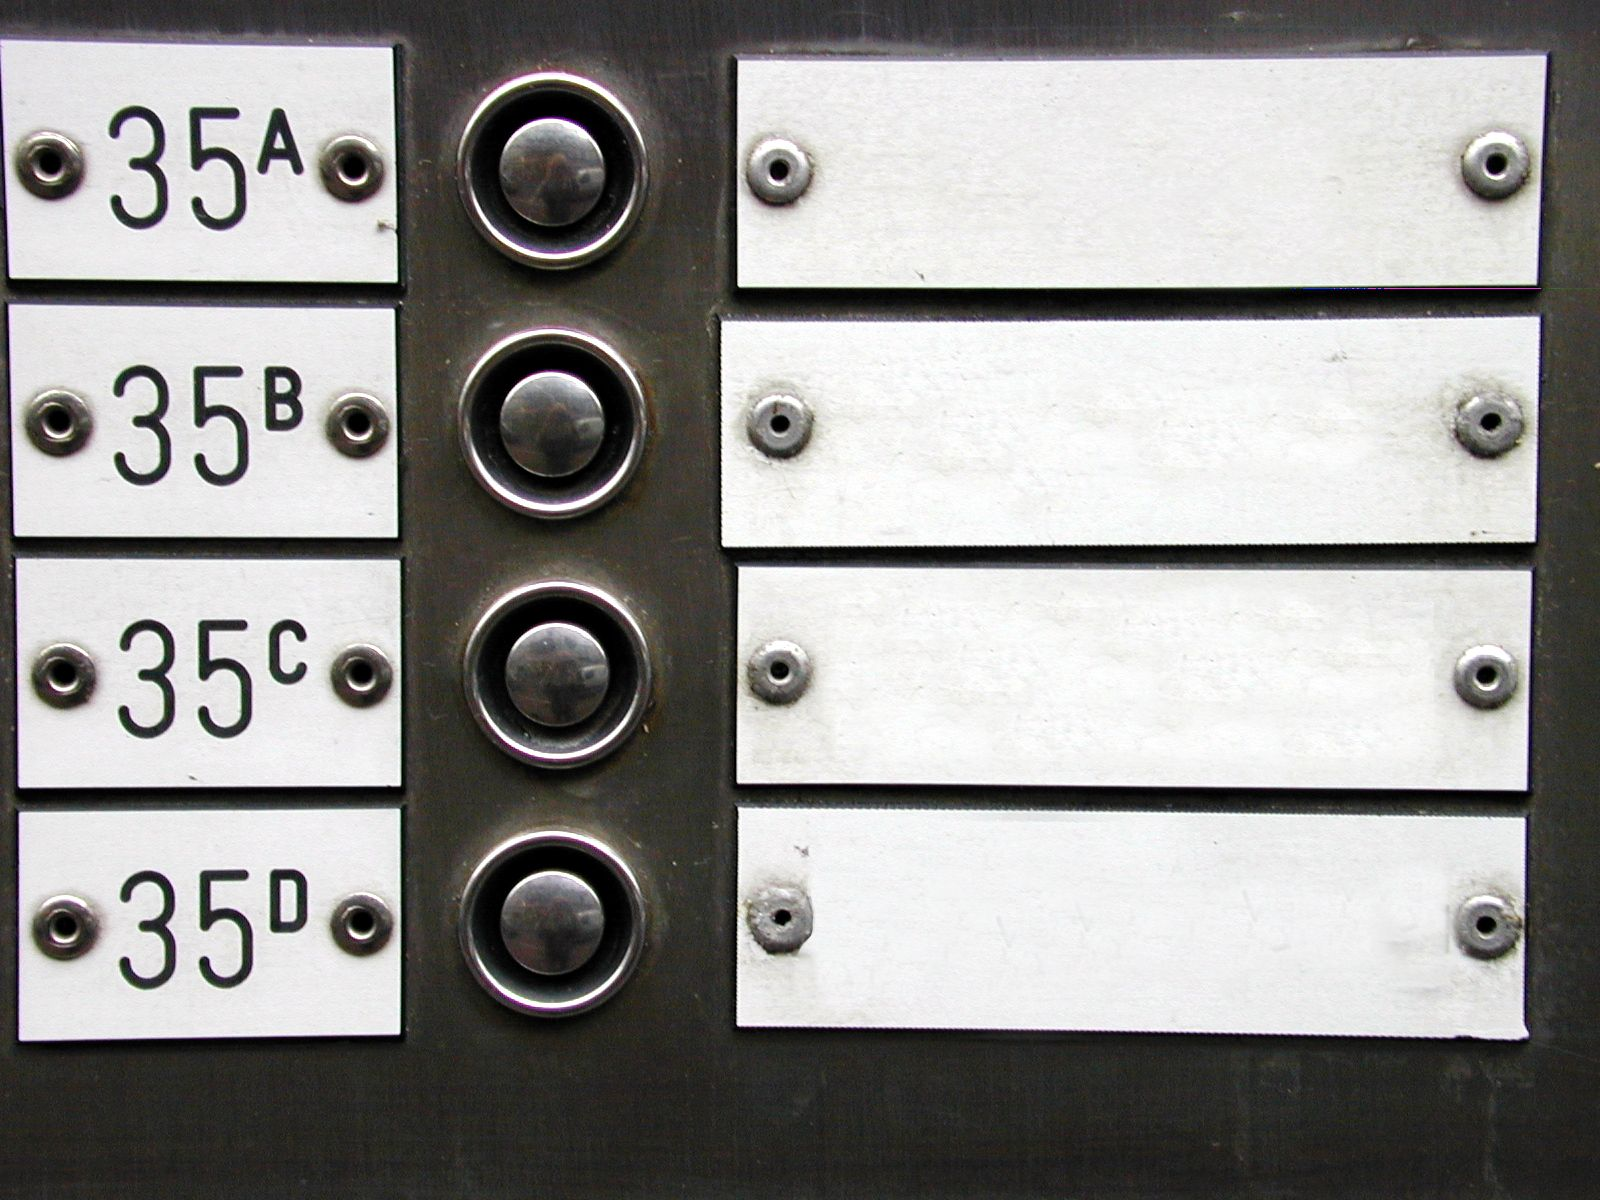 doorbells houses numbers name tags plates